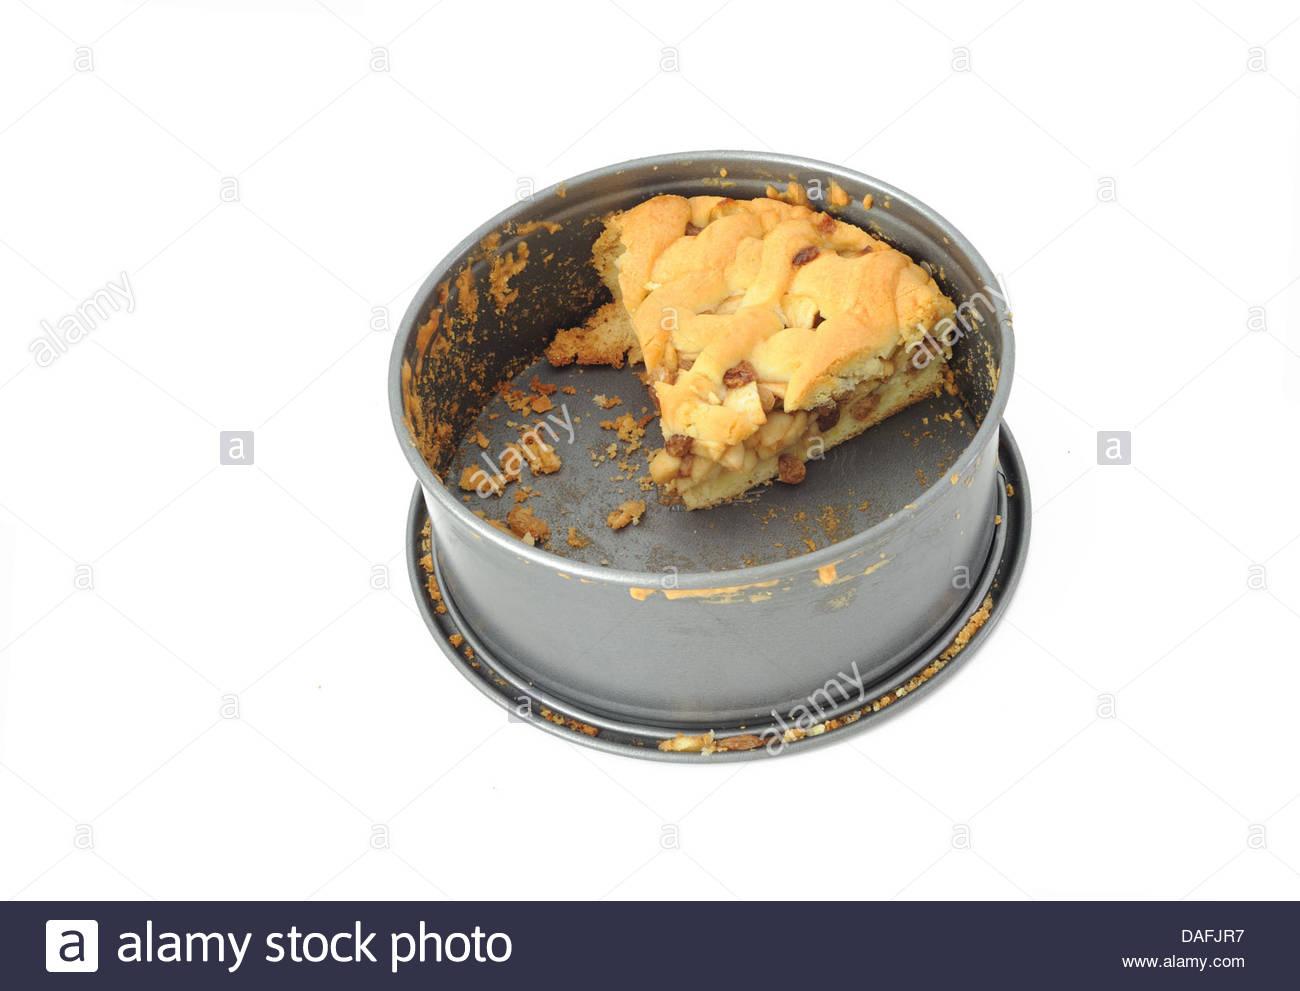 Homemade Dutch apple pie. - Stock Image